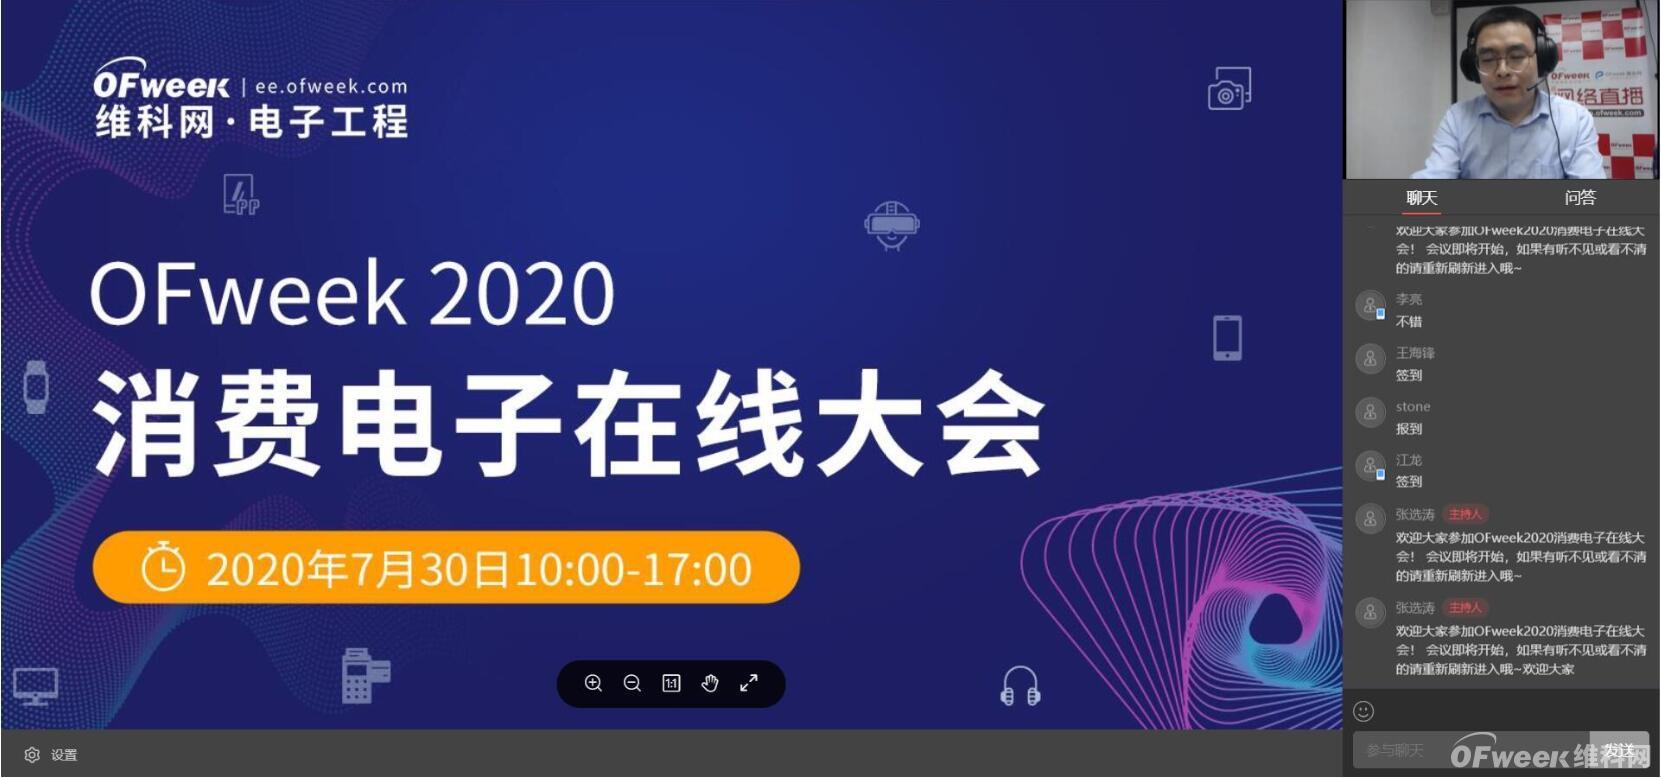 """OFweek 2020消费电子在线大会""火热进行中"